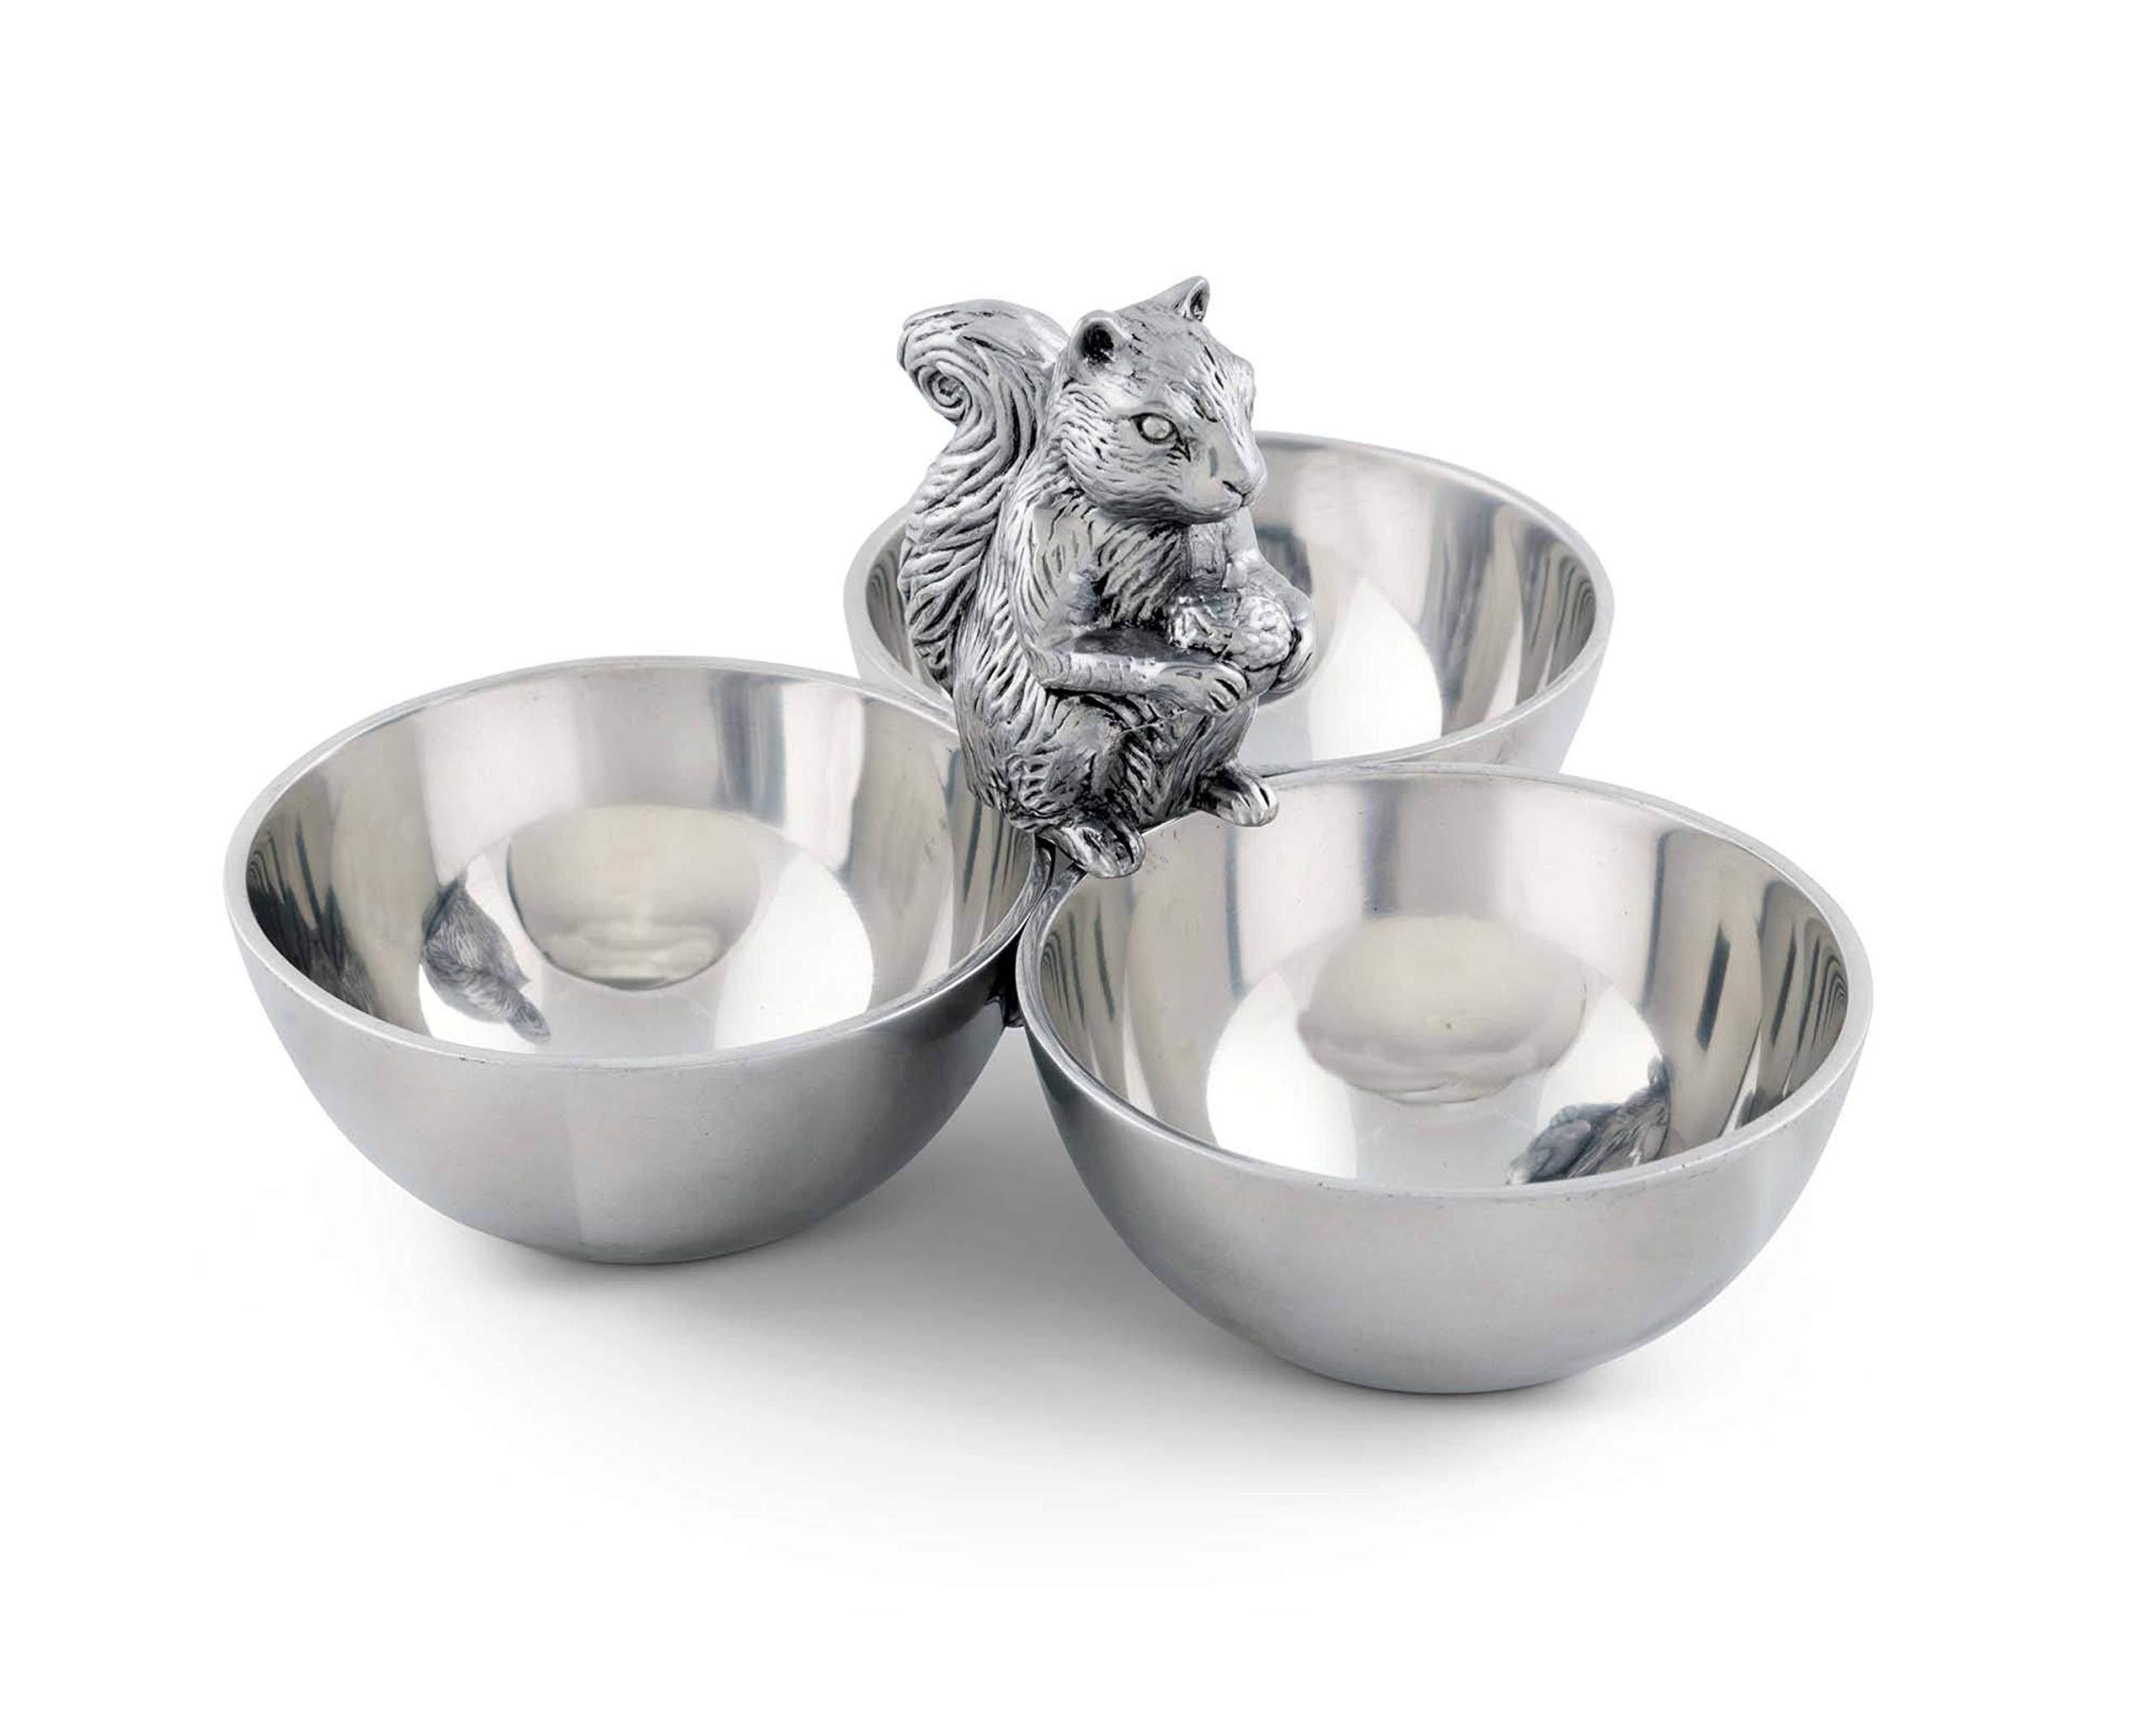 Arthur Court Squirrel 3 Bowl Nut/Snacks/Candy Ensemble - Cast Aluminum Hand Polished 6'' x 9'' x 9''